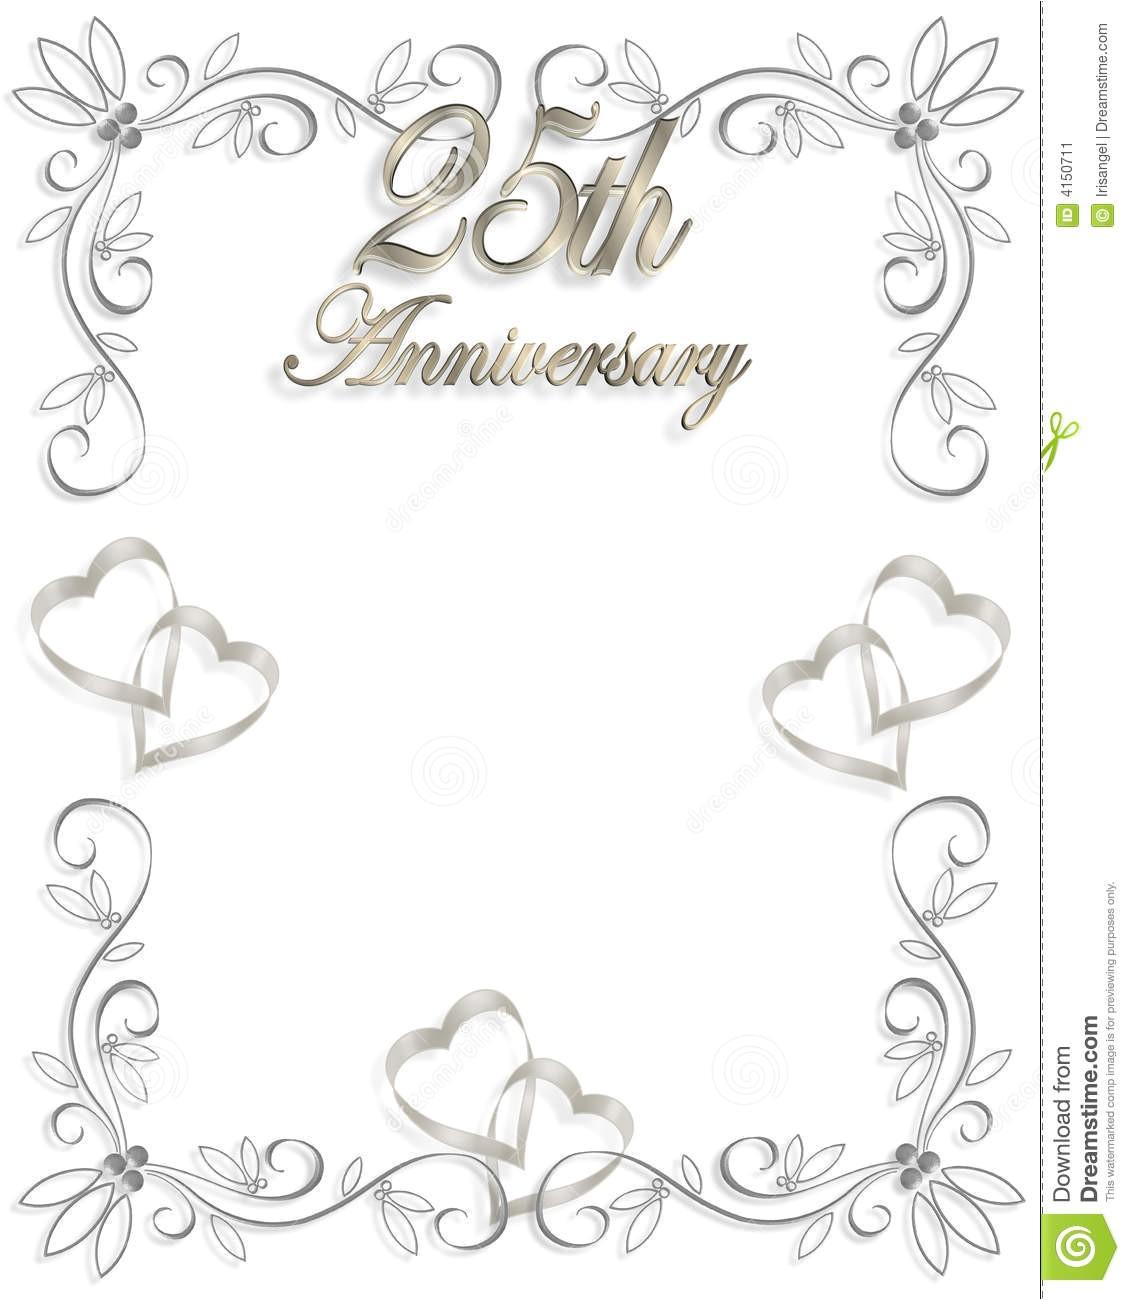 stock image 25th wedding anniversary invitation image4150711